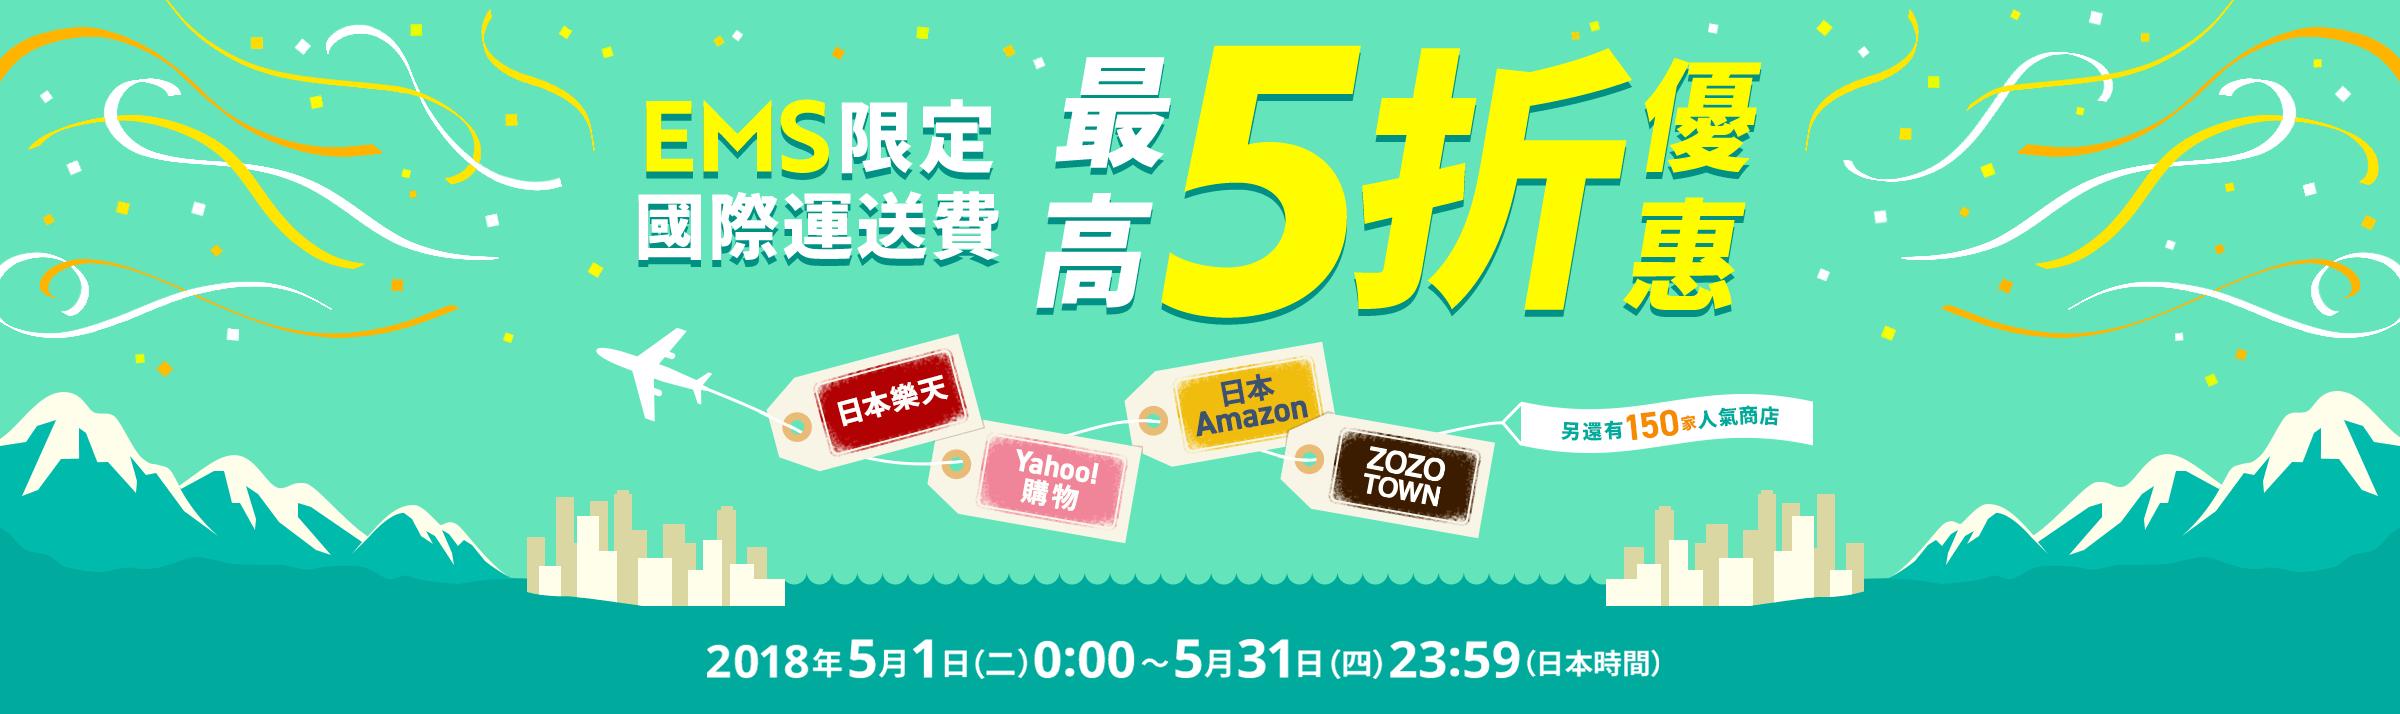 EMS限定!國際轉送費最大5折優惠活動!